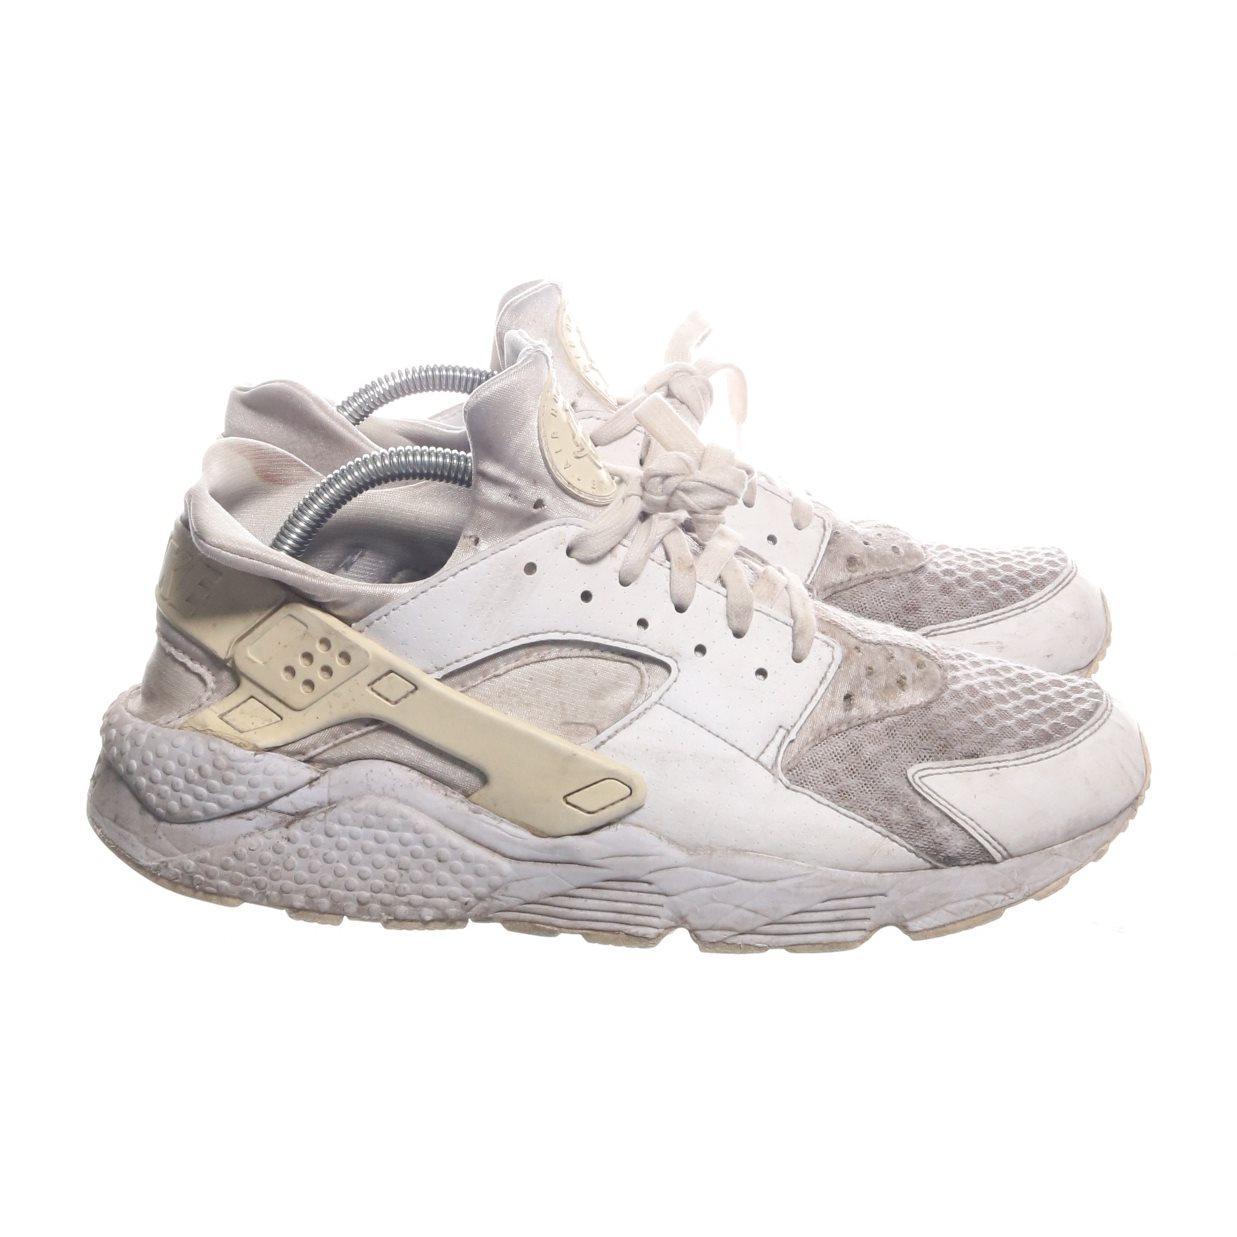 new concept 1e3e1 0a782 Nike Air Max, Sneakers, Strl  45, Huarache, Vit